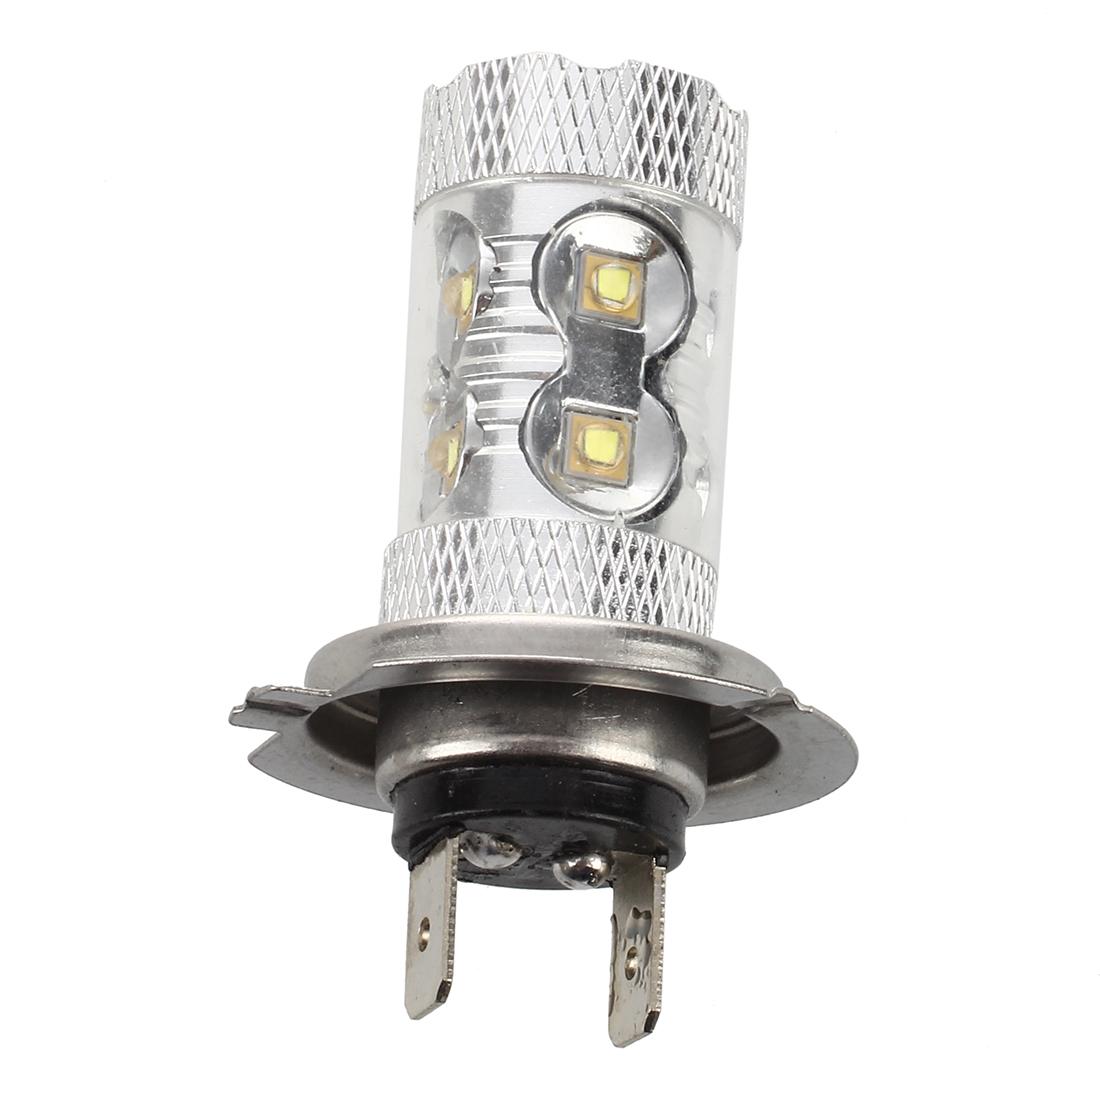 lamp 50w h7 472 white 6500k led bulb auto headlight y9r7. Black Bedroom Furniture Sets. Home Design Ideas